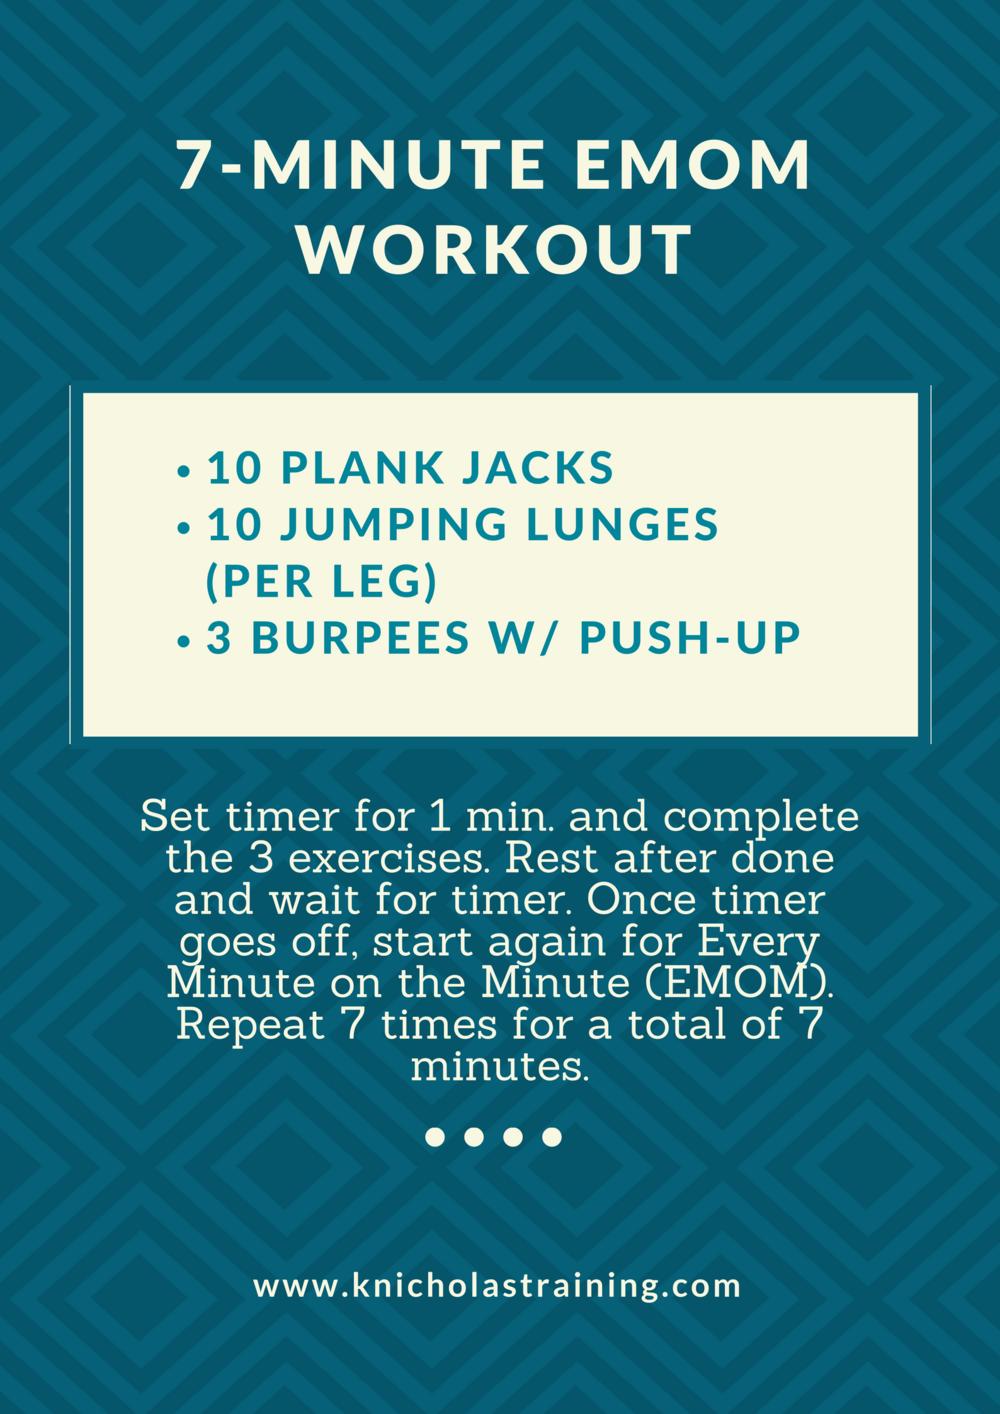 7-Min. EMOM Workout